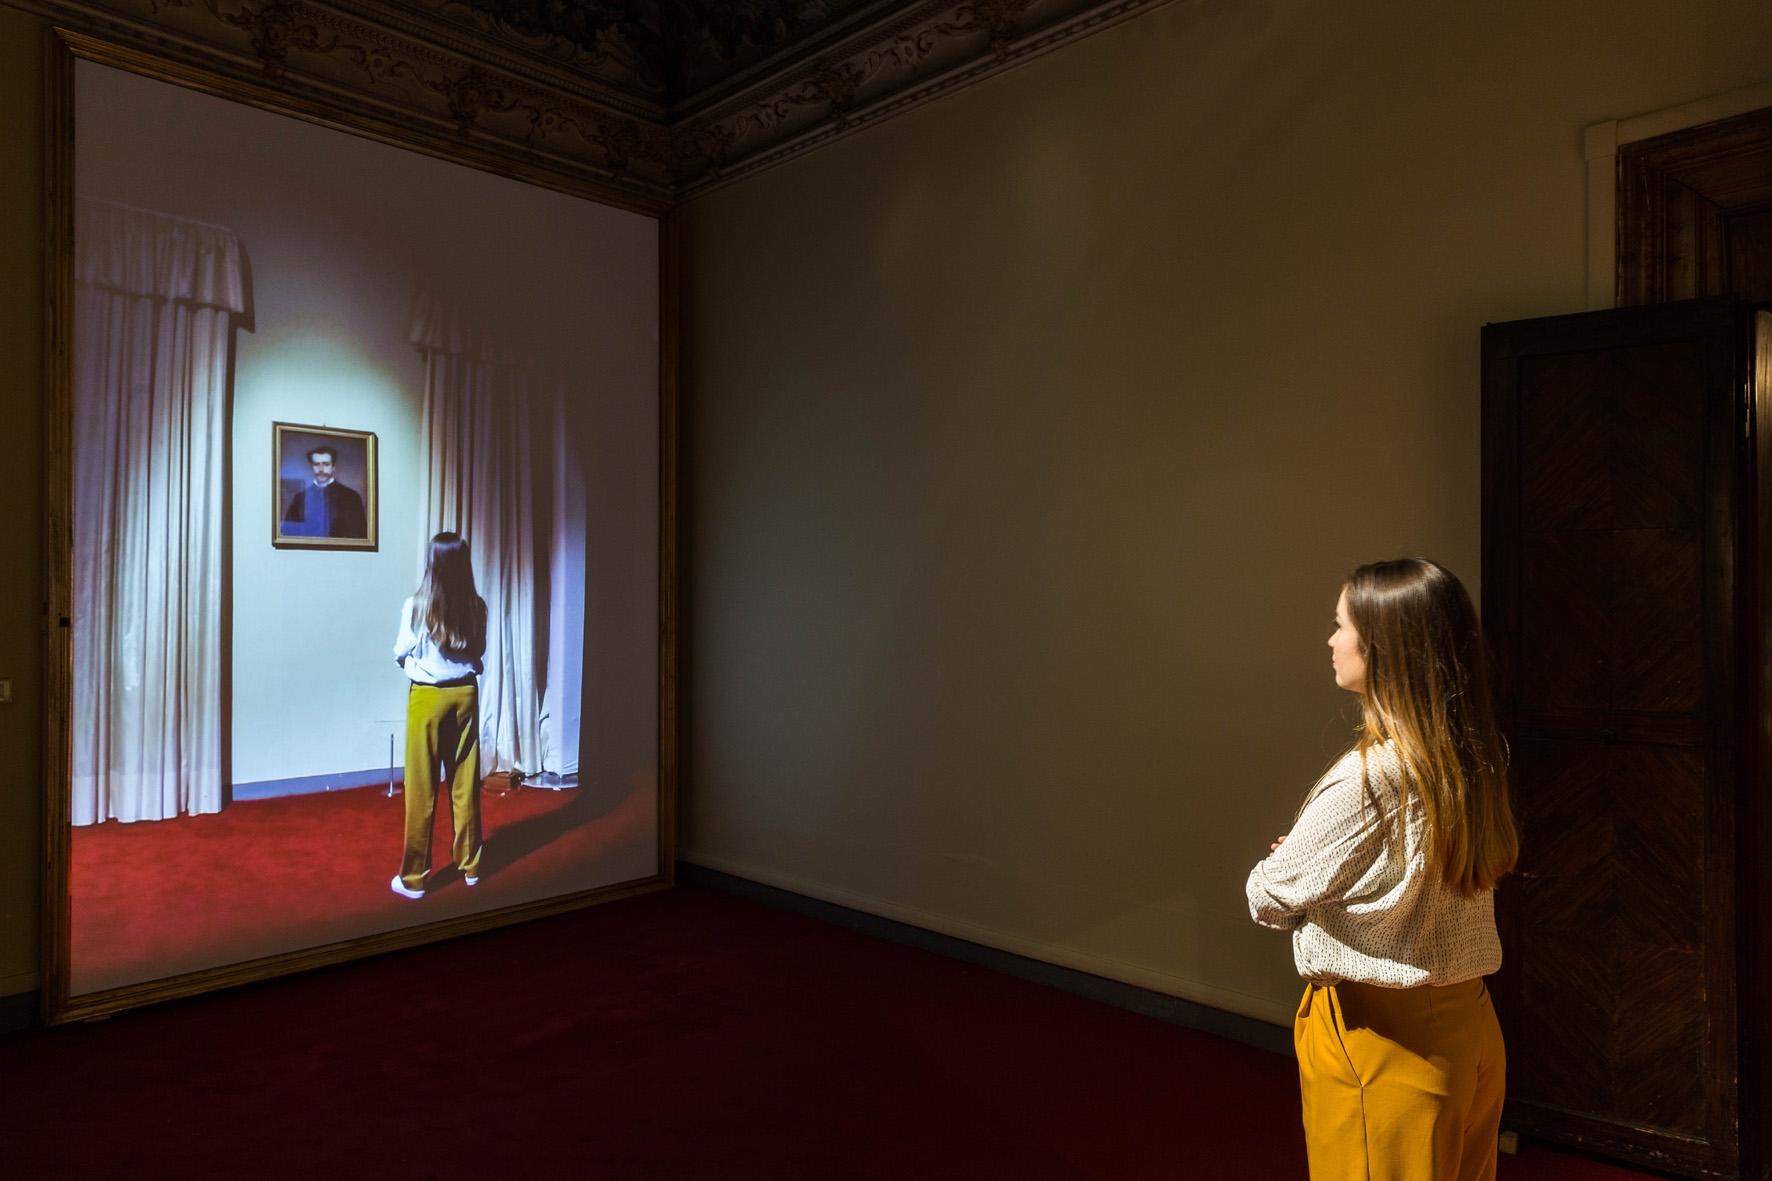 Rashid Rana I do not always feel immaterial 2015 video installazione interattiva ©Mark Blower